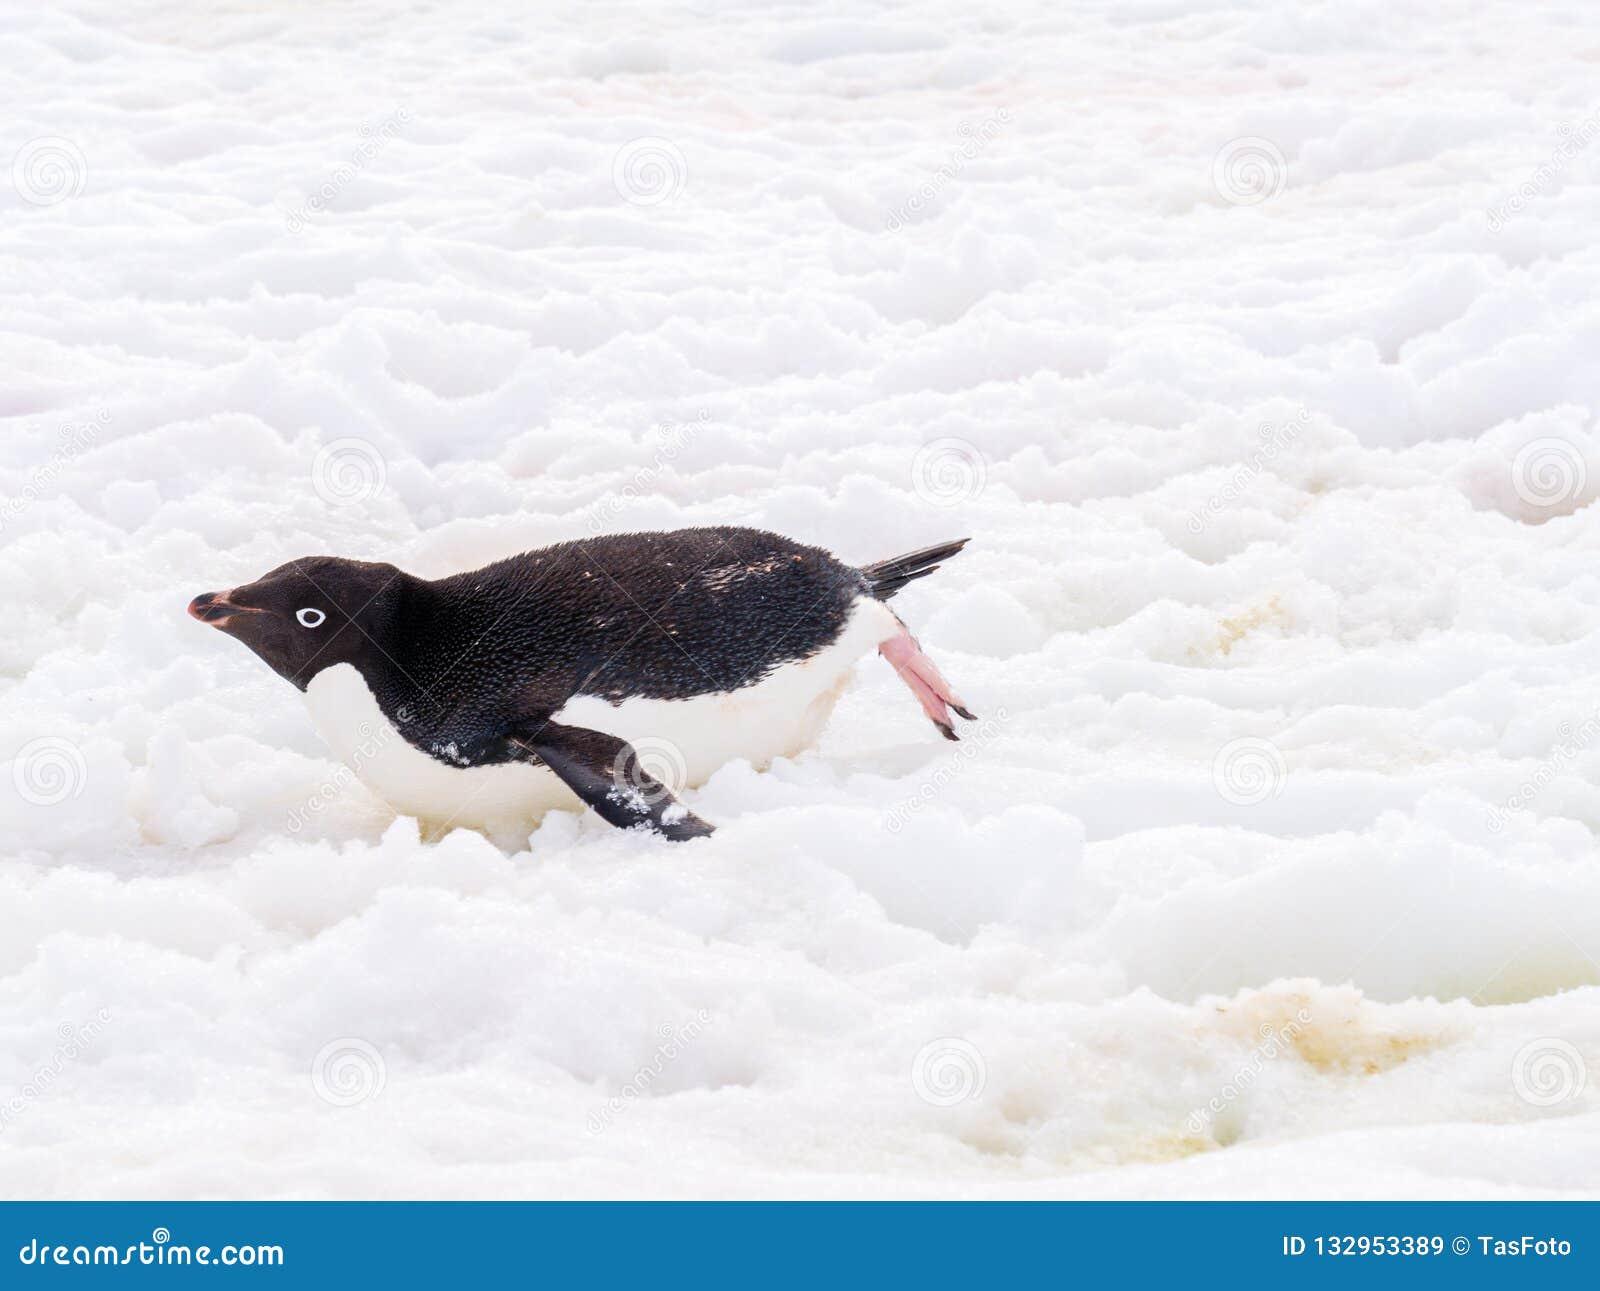 Adelie penguin, Pygoscelis adeliae, sliding across snow, Petermann Island, Antarctic Peninsula, Antarctica